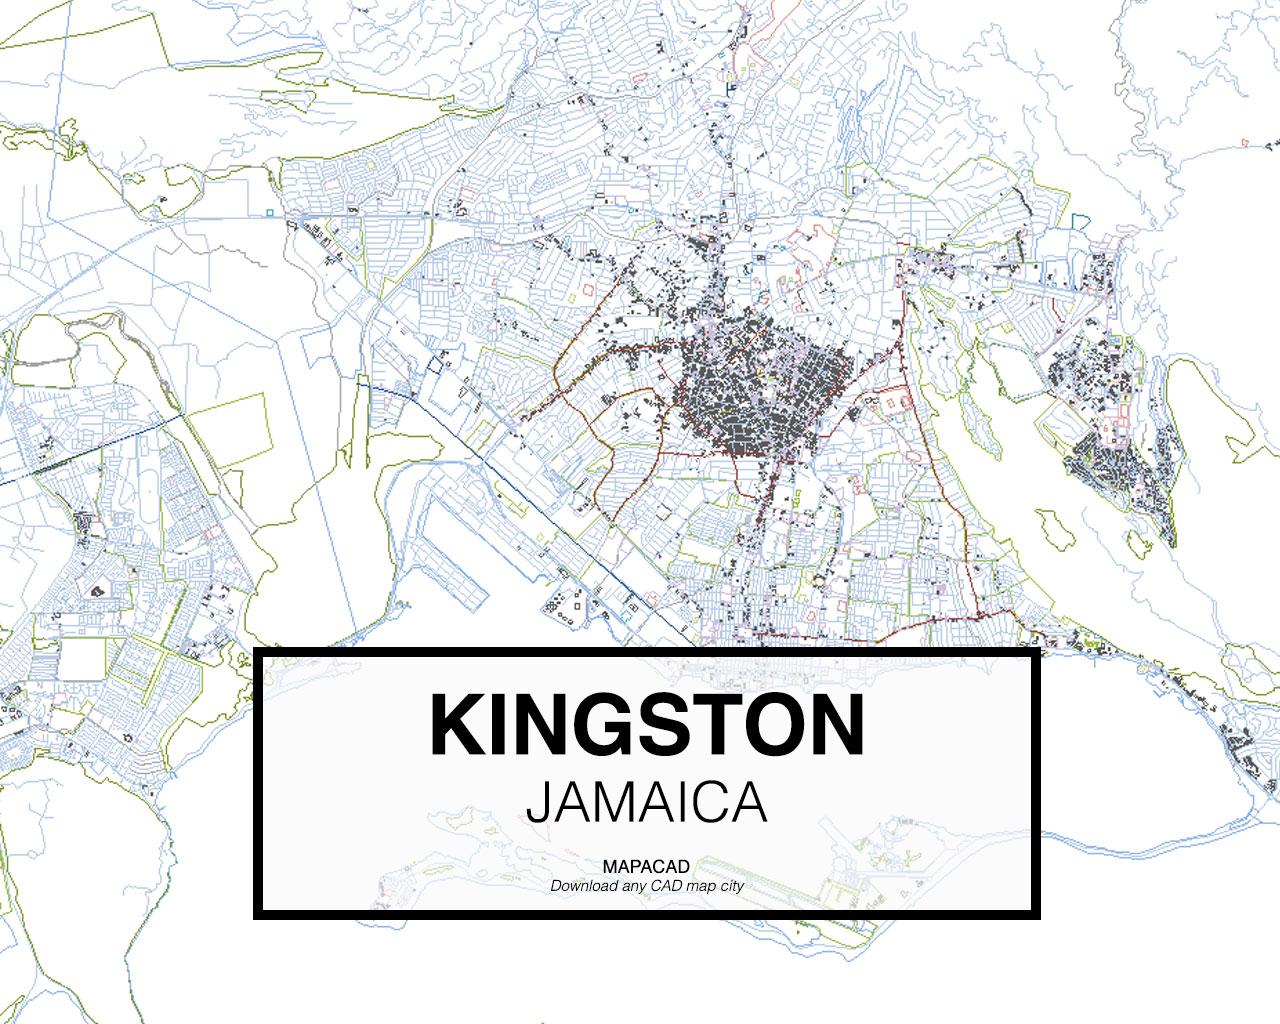 Download kingstondwg mapacad kingston jamaica 01 mapacad download map cad dwg gumiabroncs Choice Image